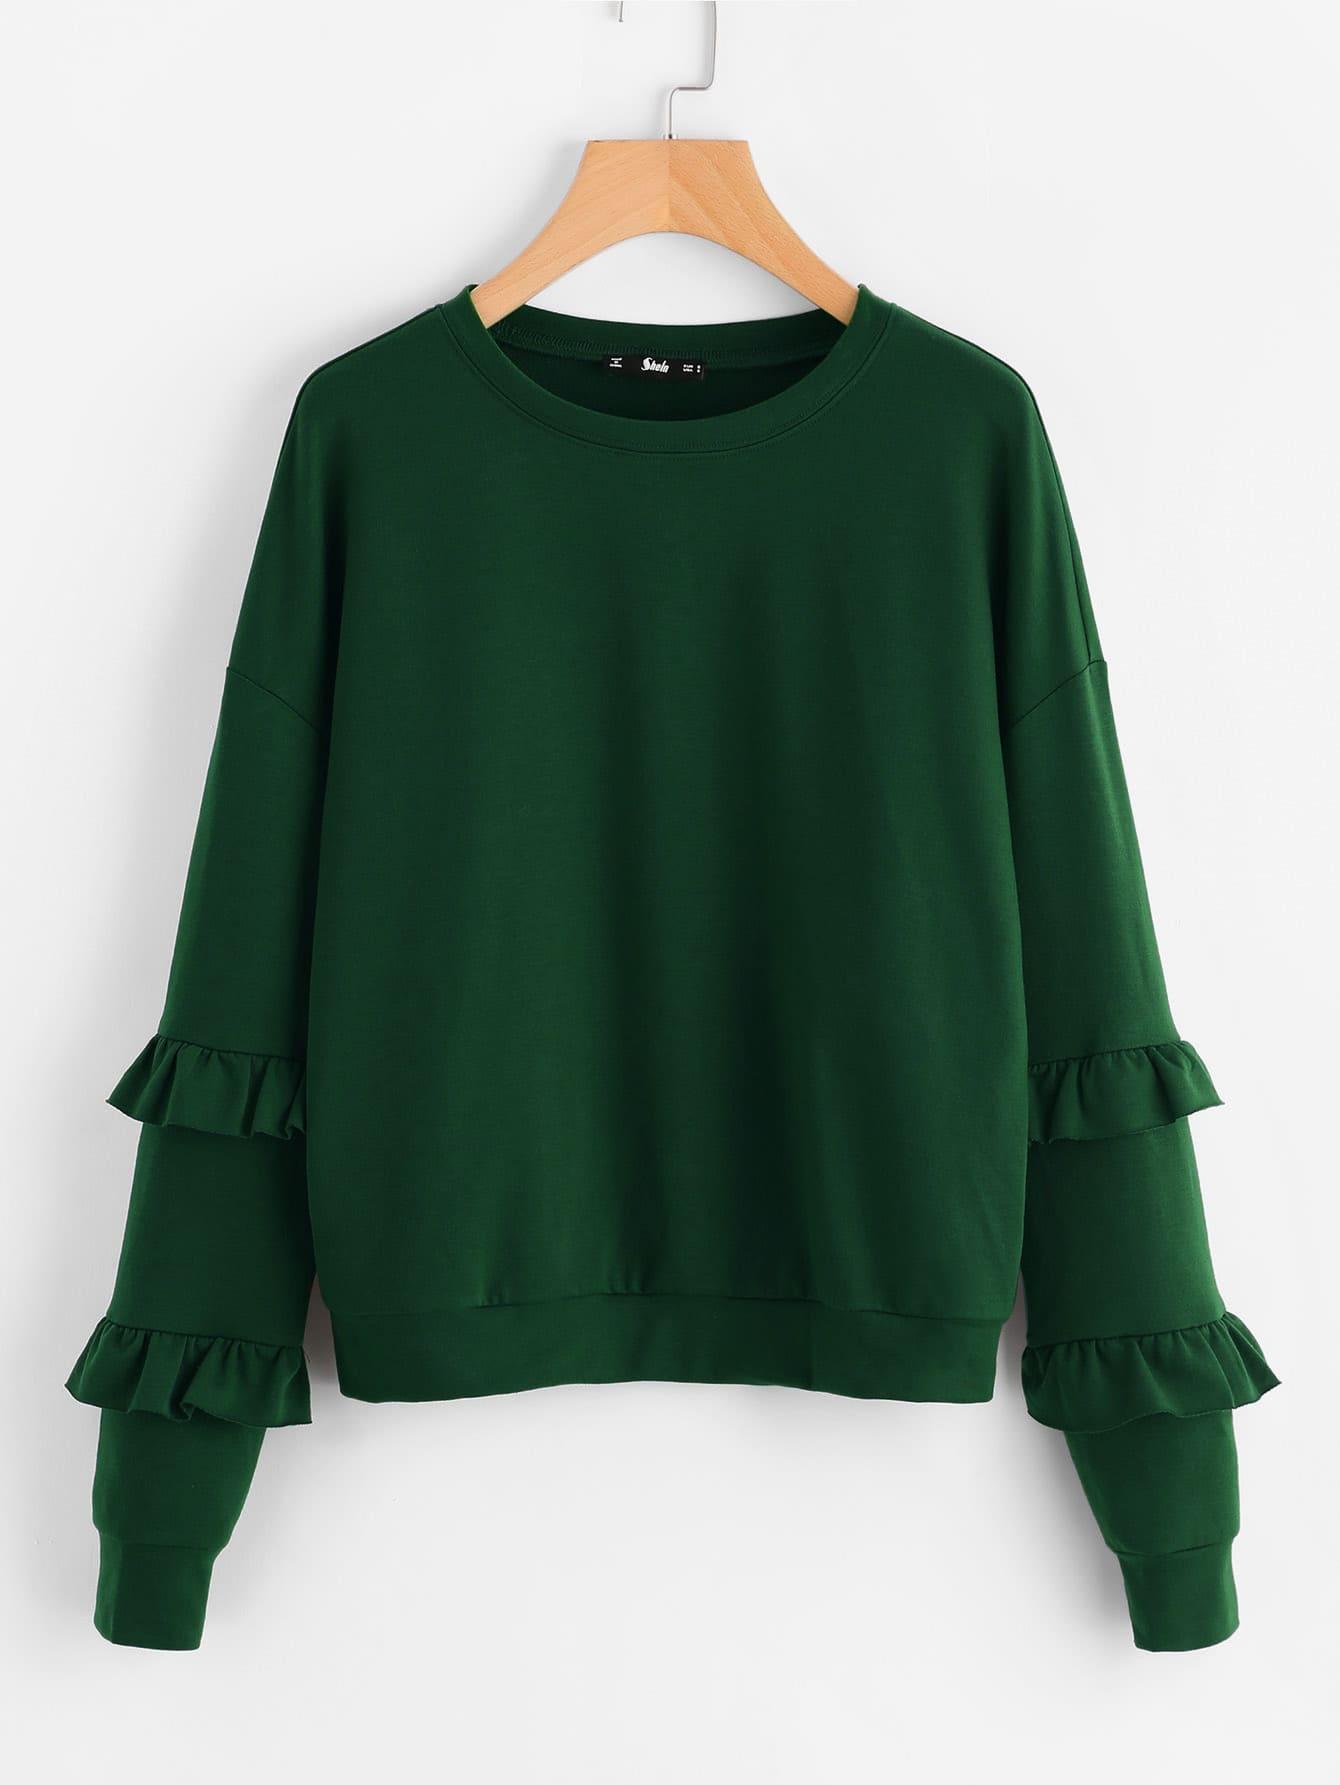 Drop Shoulder Ruffle Sleeve Sweatshirt drop shoulder flounce trim sleeve sweatshirt